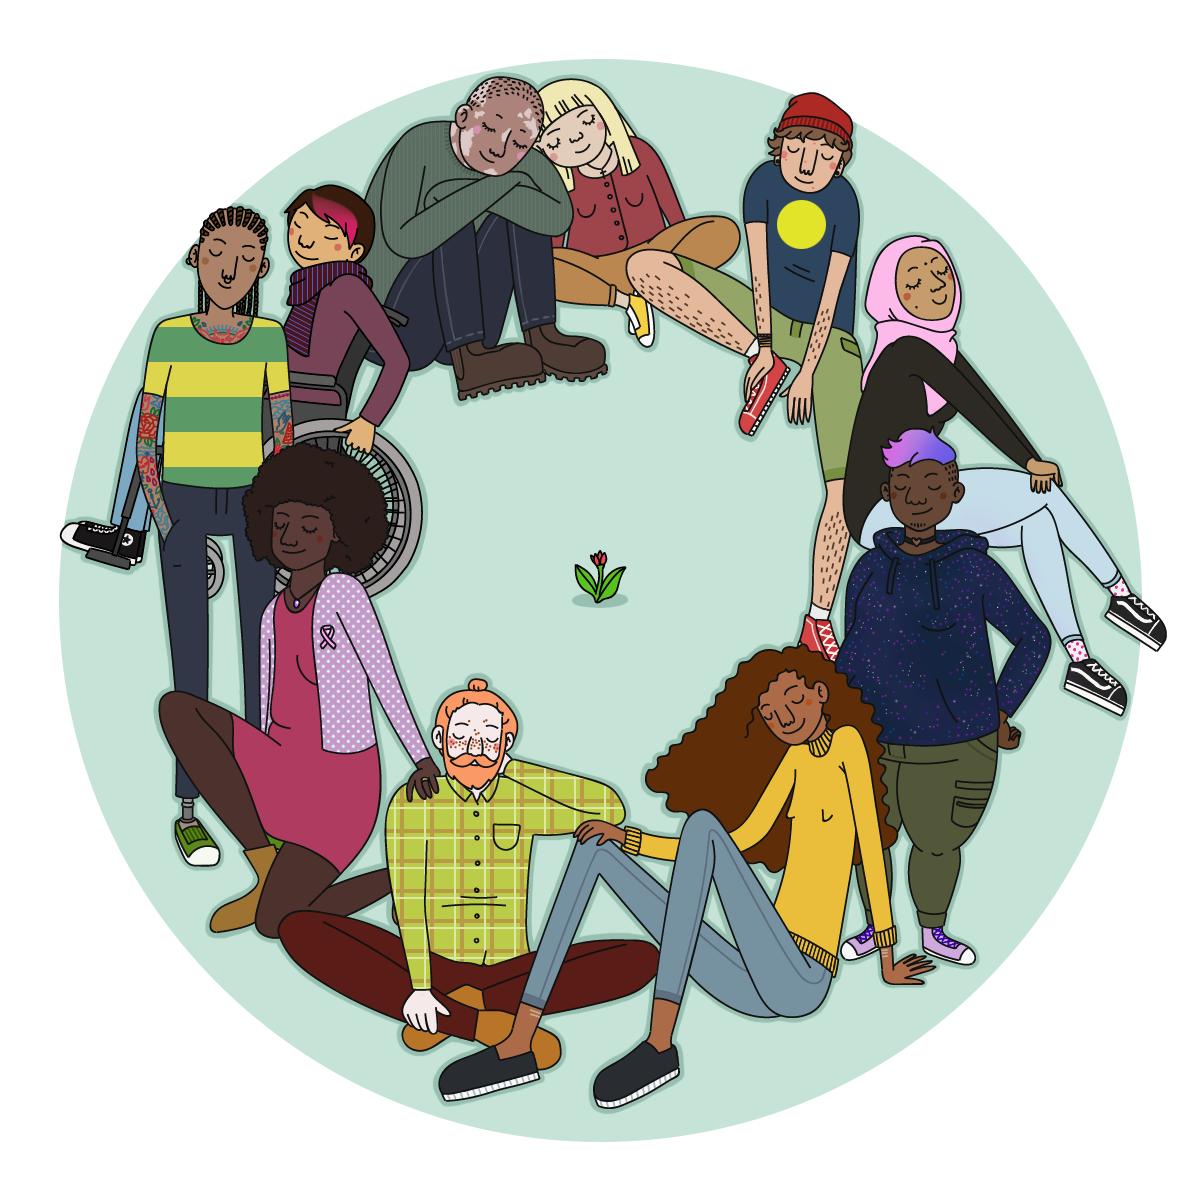 IN TRULY DIVERSE LYFTA, DIVERSITY IS NOT A GOAL - theme: diversity